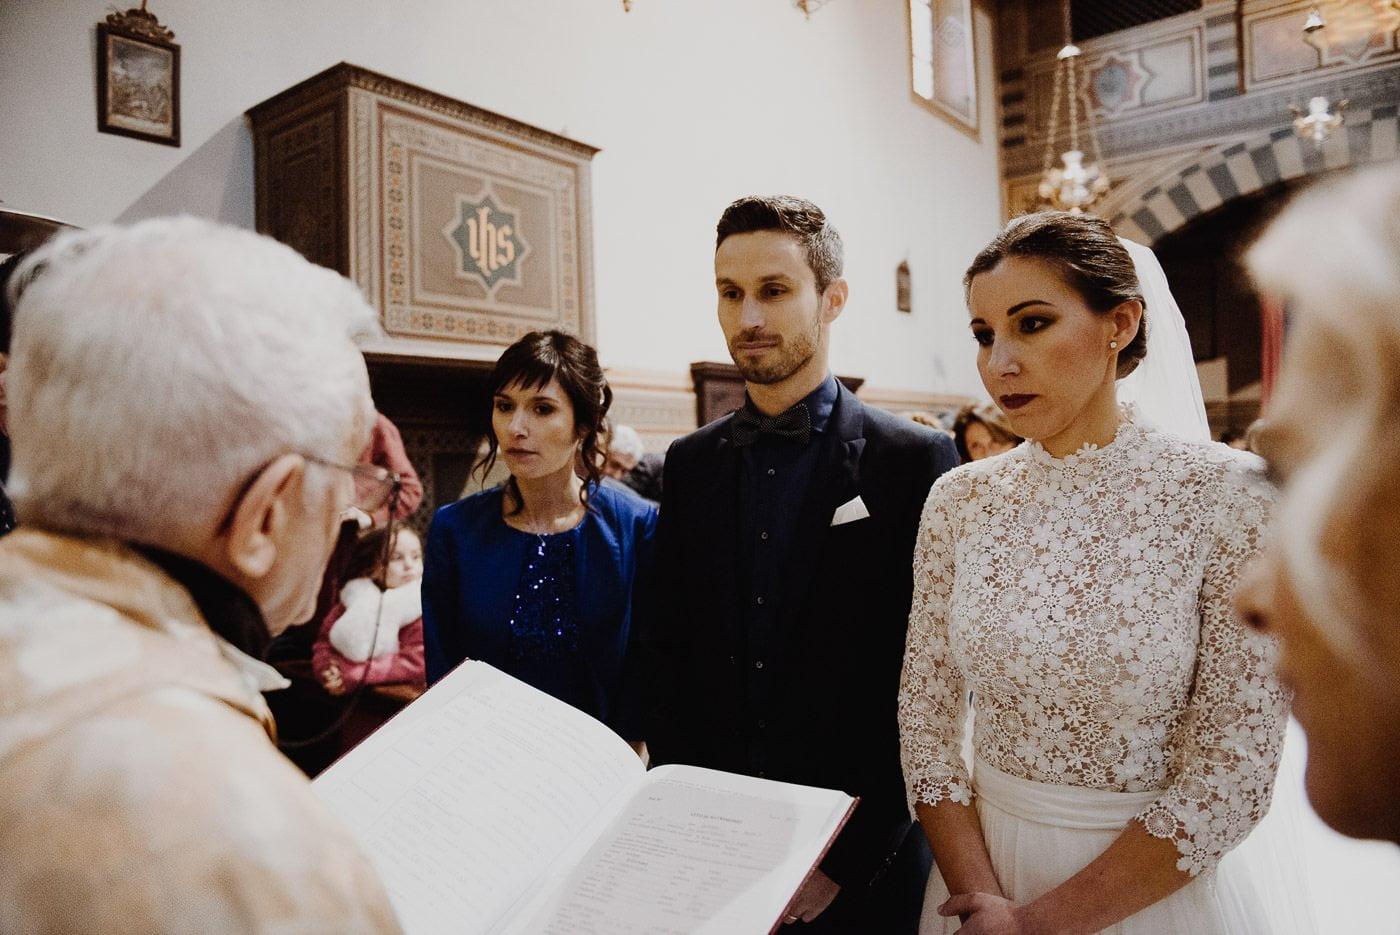 Matrimonio Giulia & Alessandro 28_12 – Alessio Nobili Photographer-25